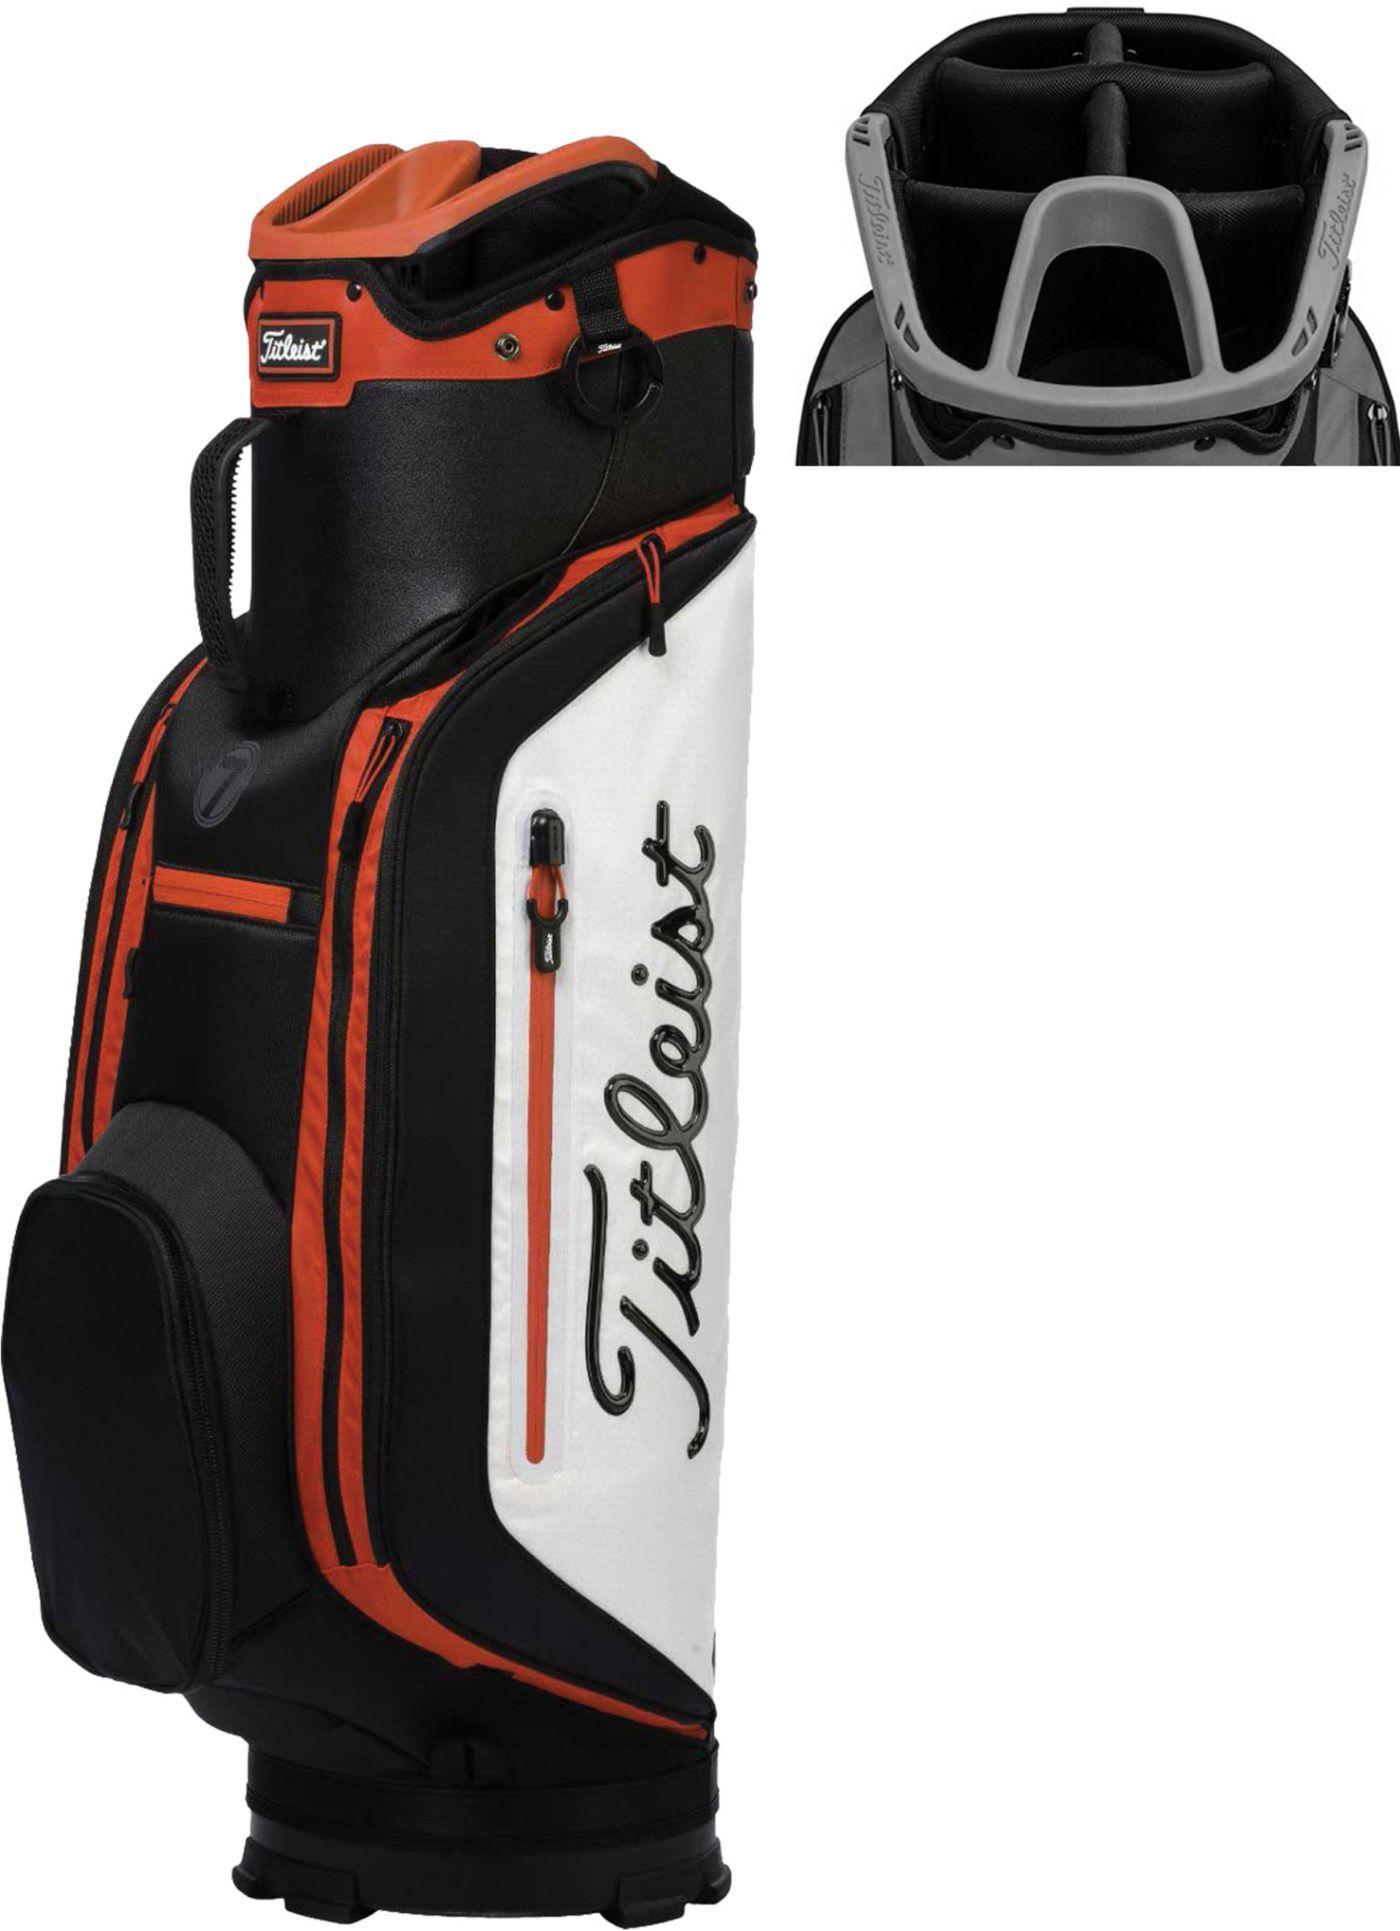 Titleist 2018 Club 7 Cart Golf Bag